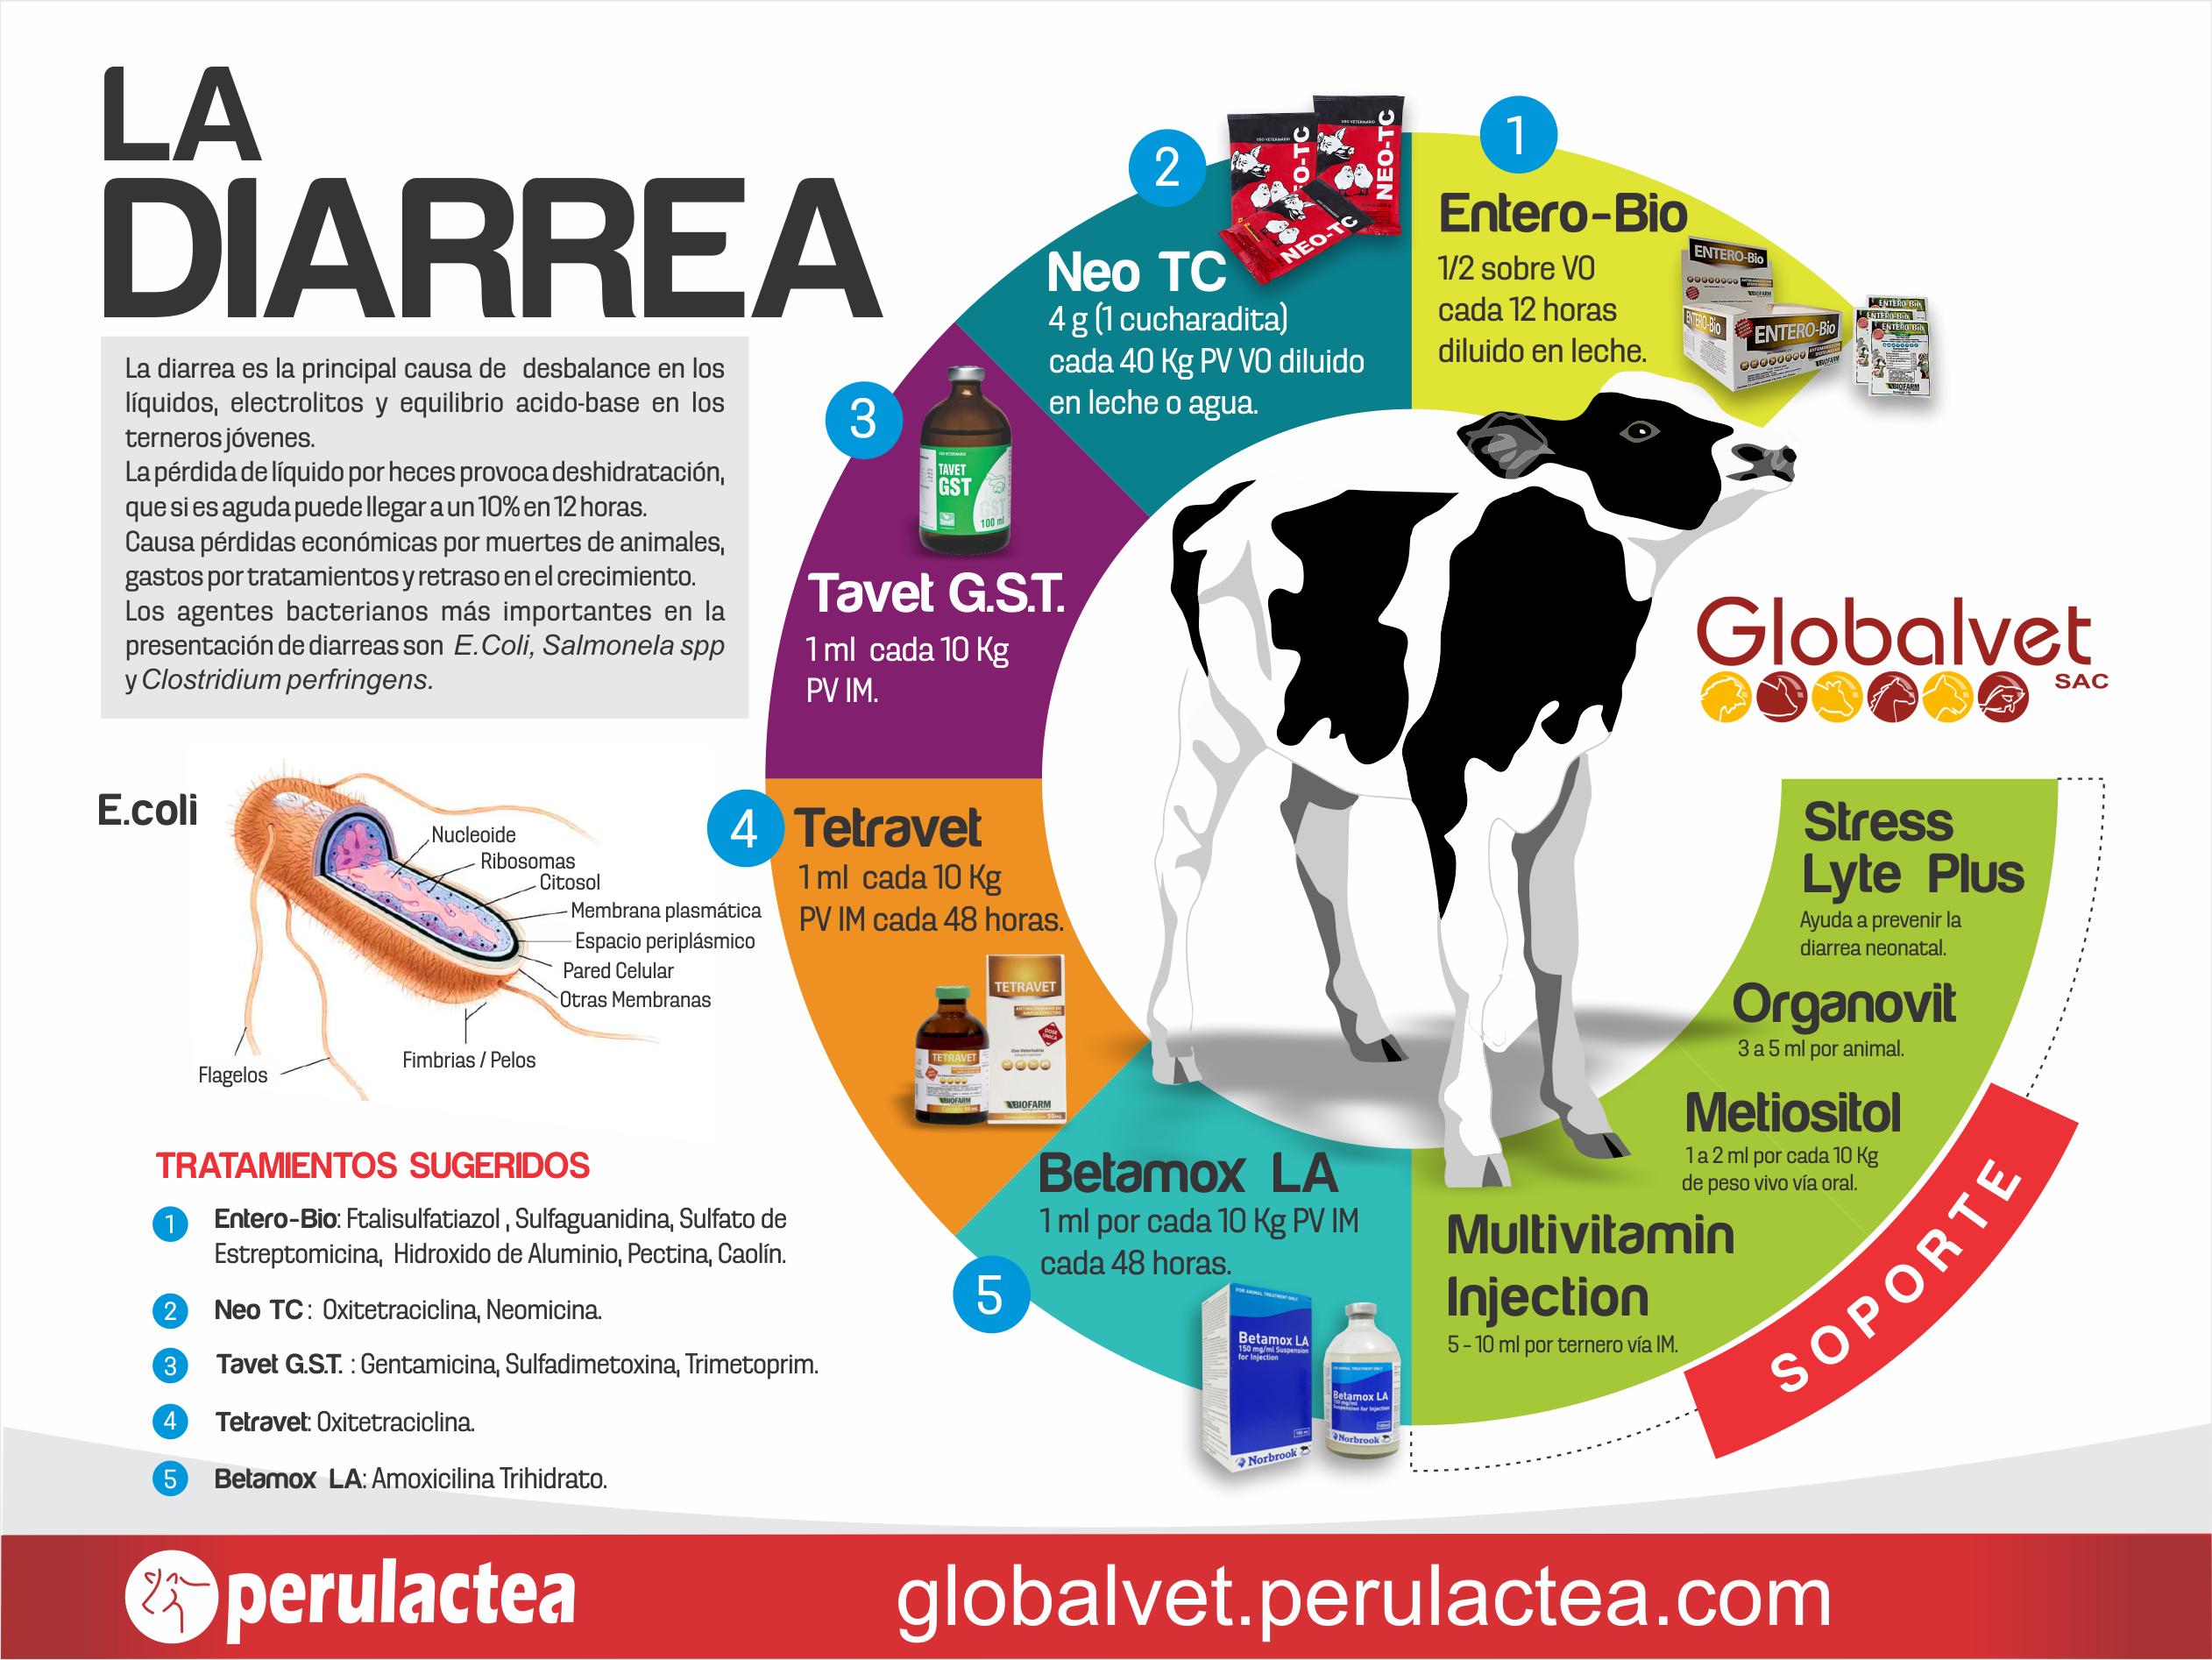 GLOBALVET-PRODUCTOS-VETERINARIOS-INFOGRAFIA-DIARREA-EN-TERNEROS